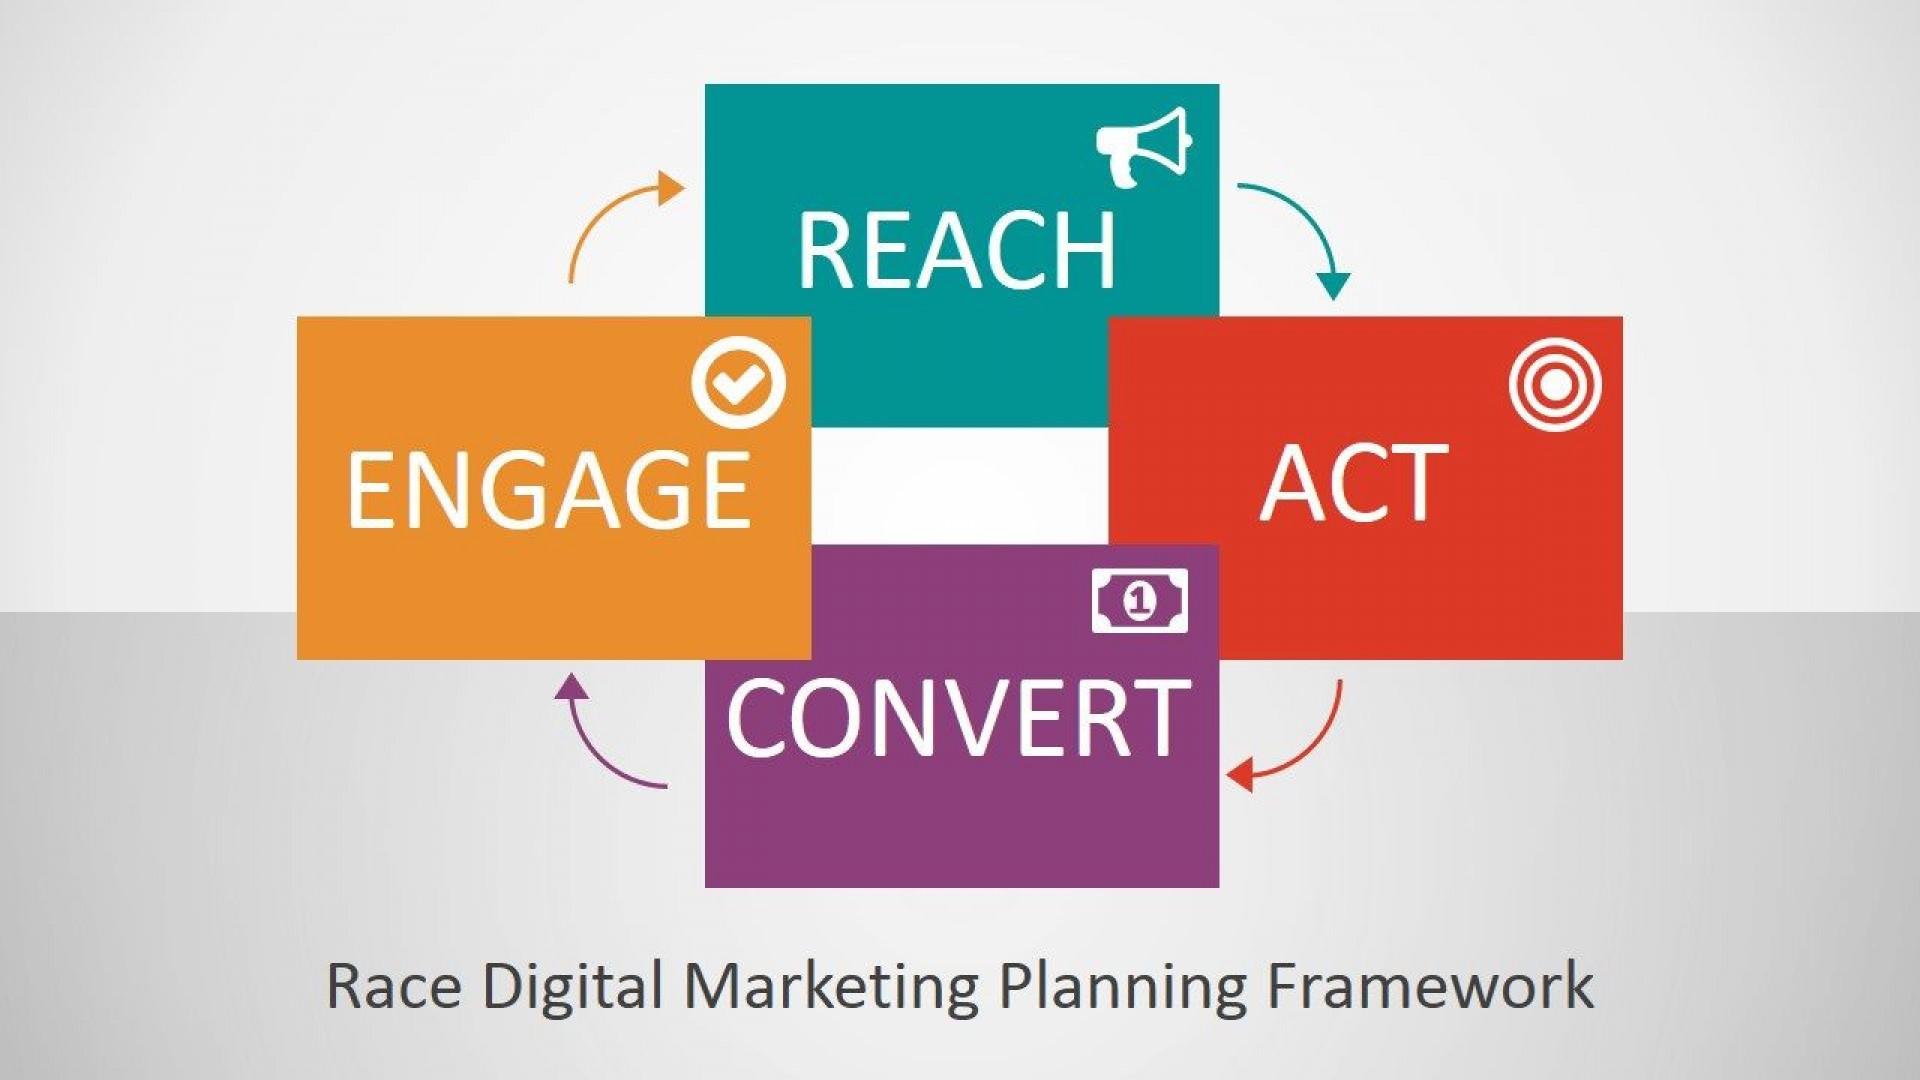 002 Rare Digital Marketing Plan Example Ppt High Definition 1920